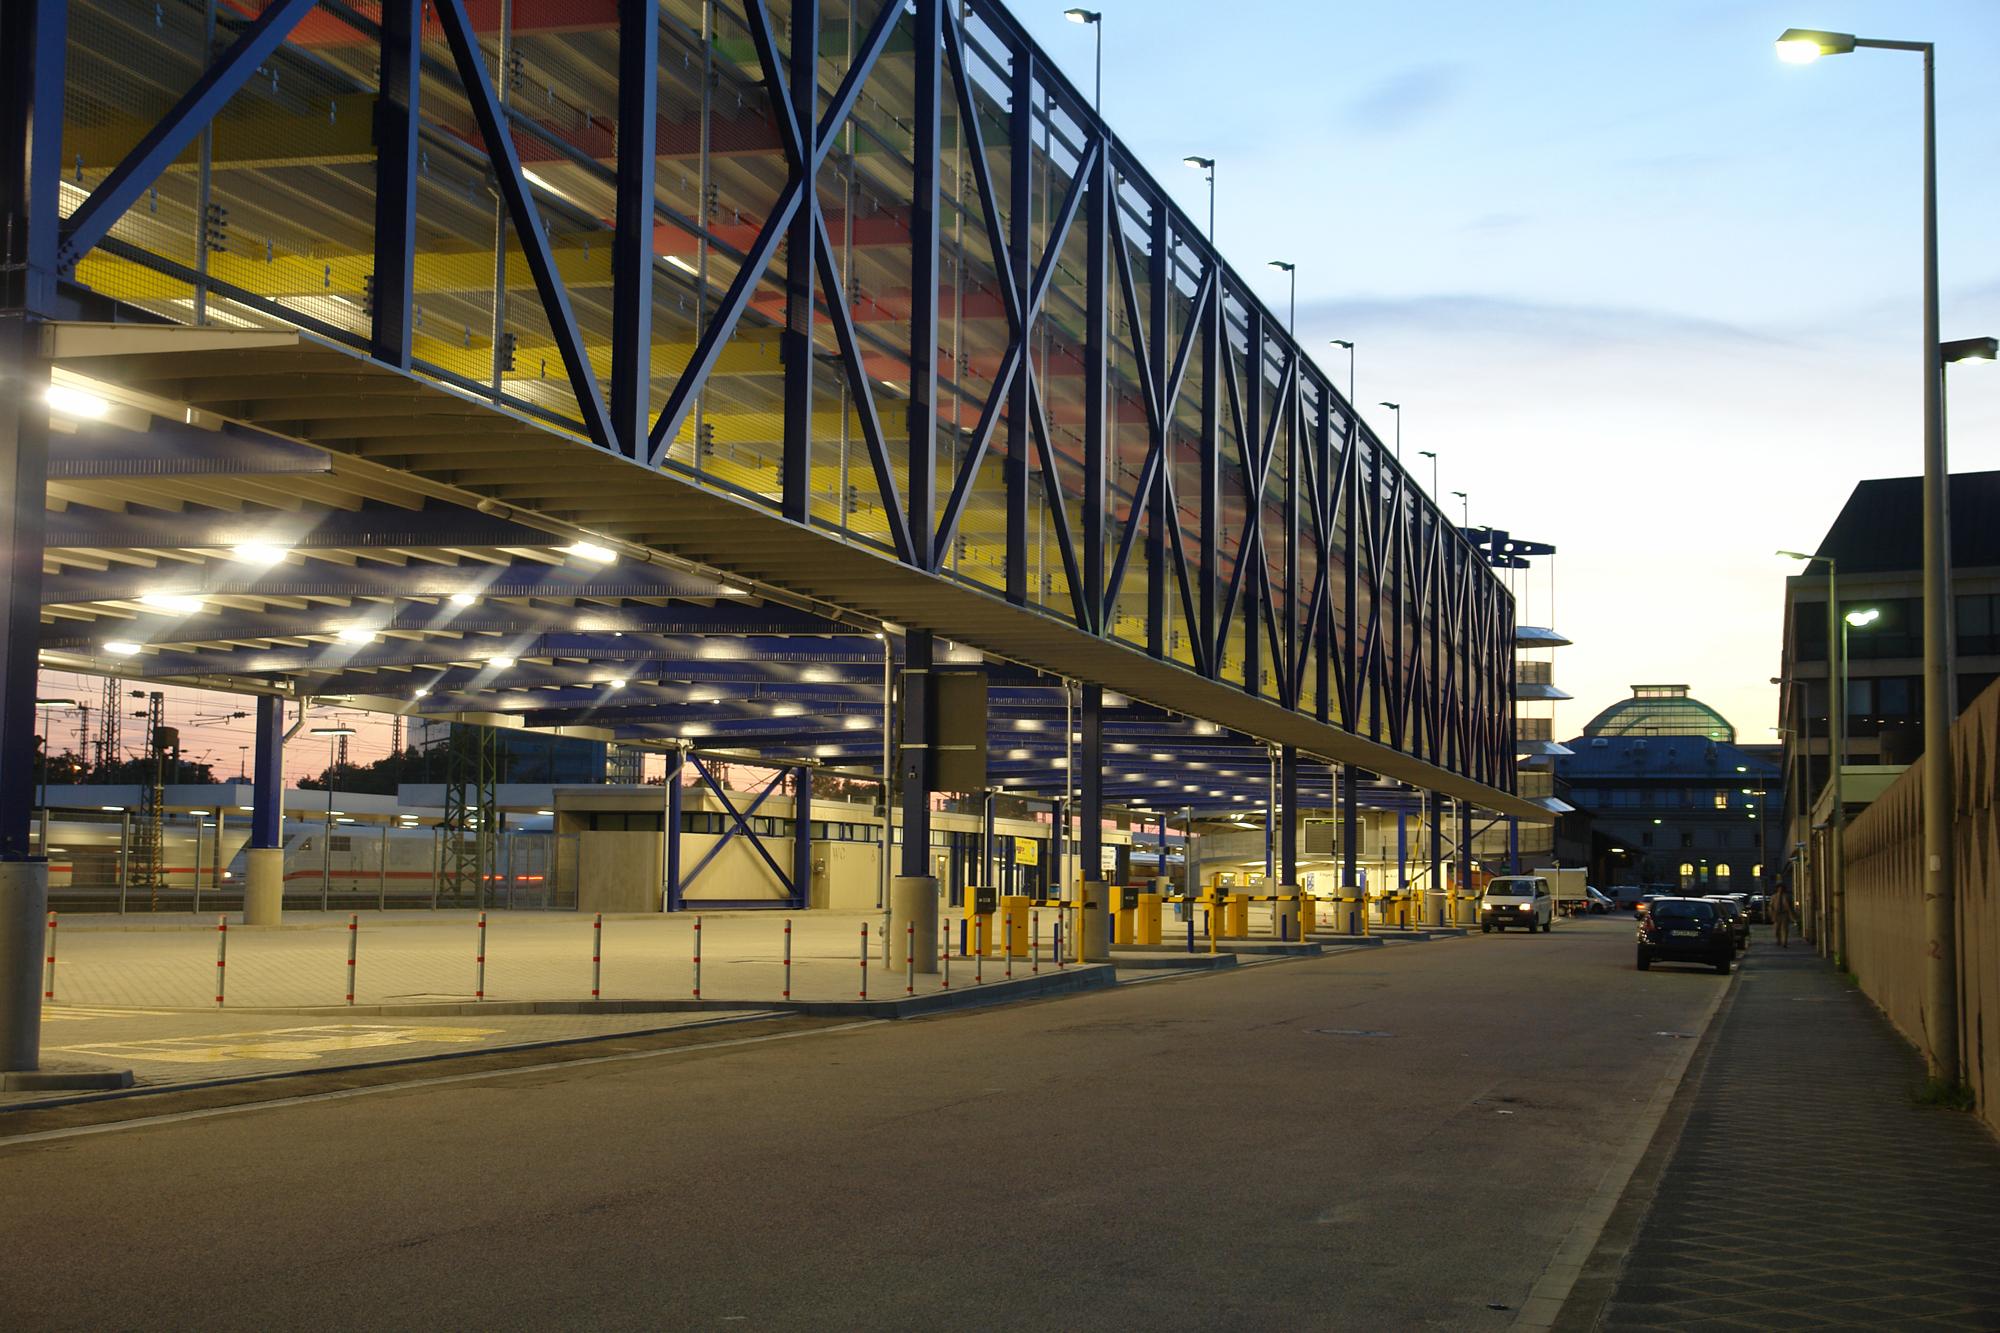 Parkhaus Hauptbahnhof P2 Mannheim